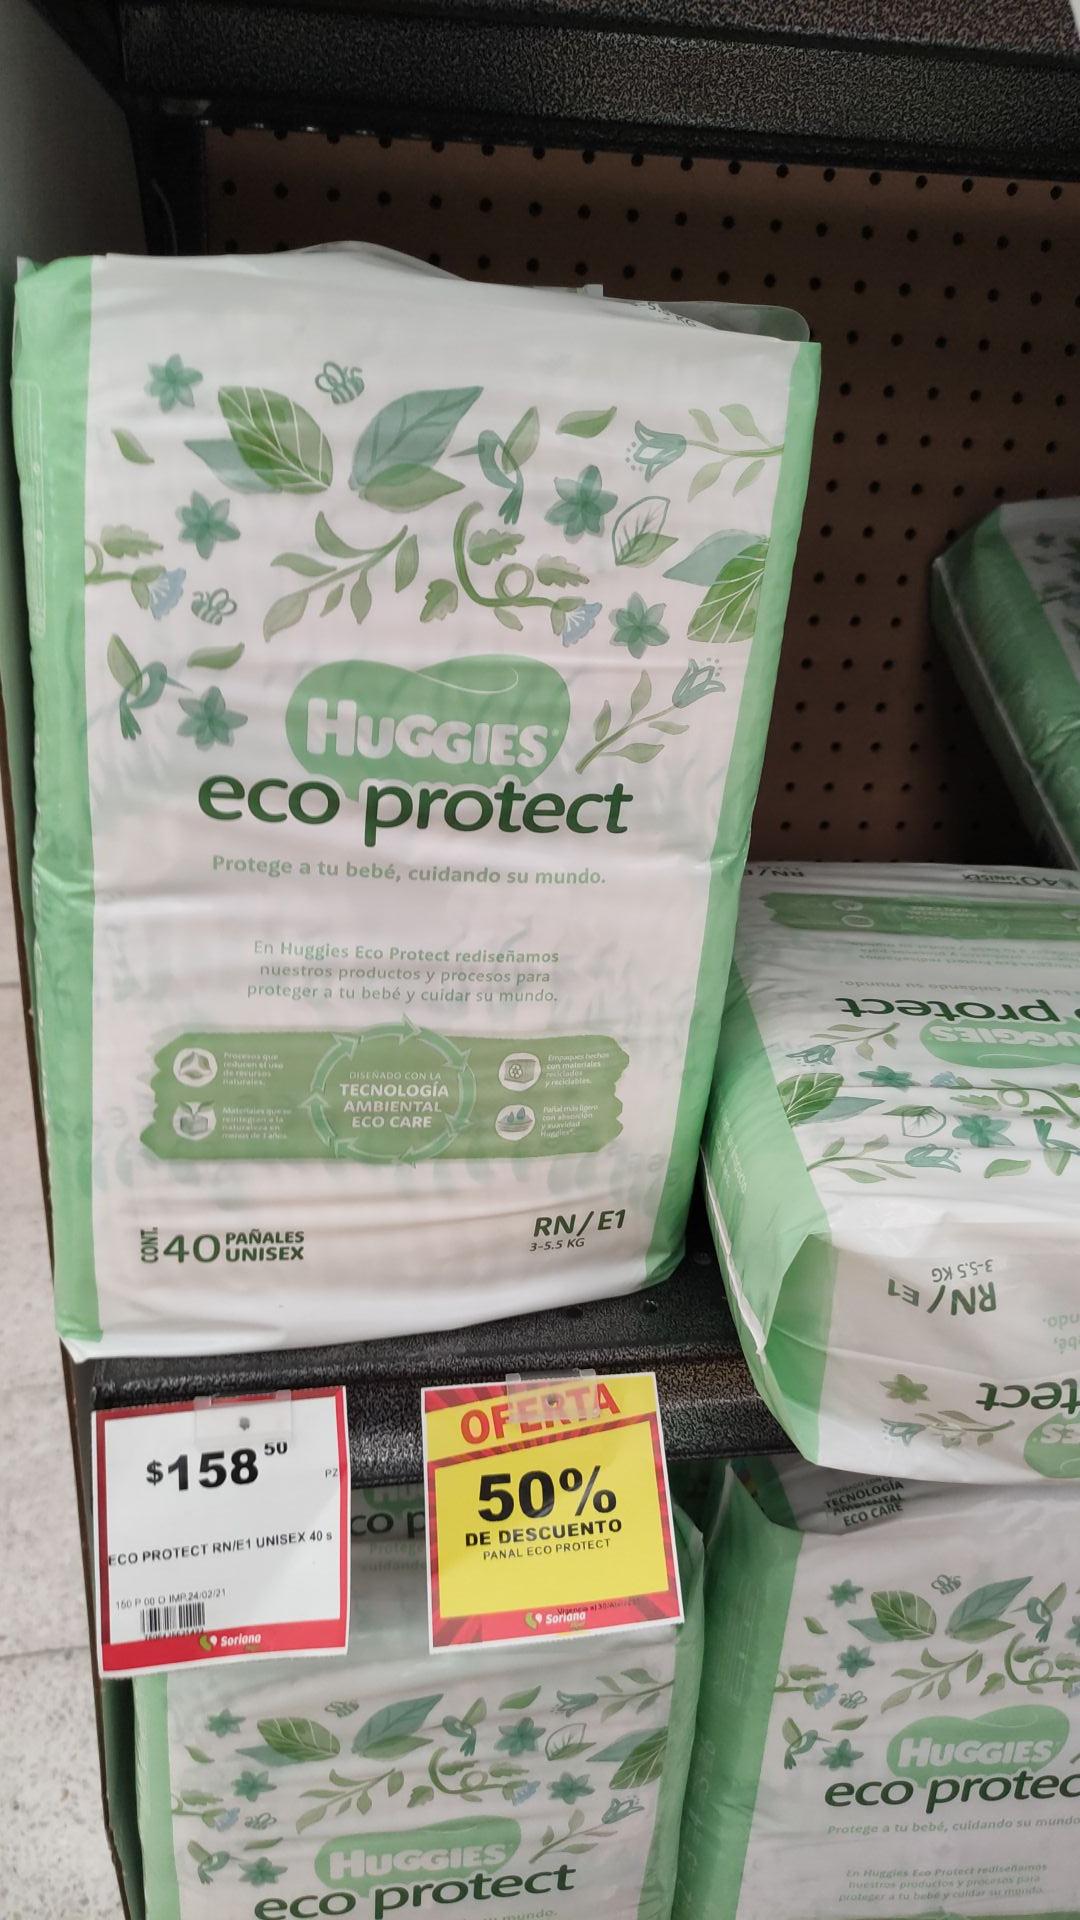 Soriana Hiper Rio consulado CDMX: Pañales Huggies Eco Protec 50% desc.